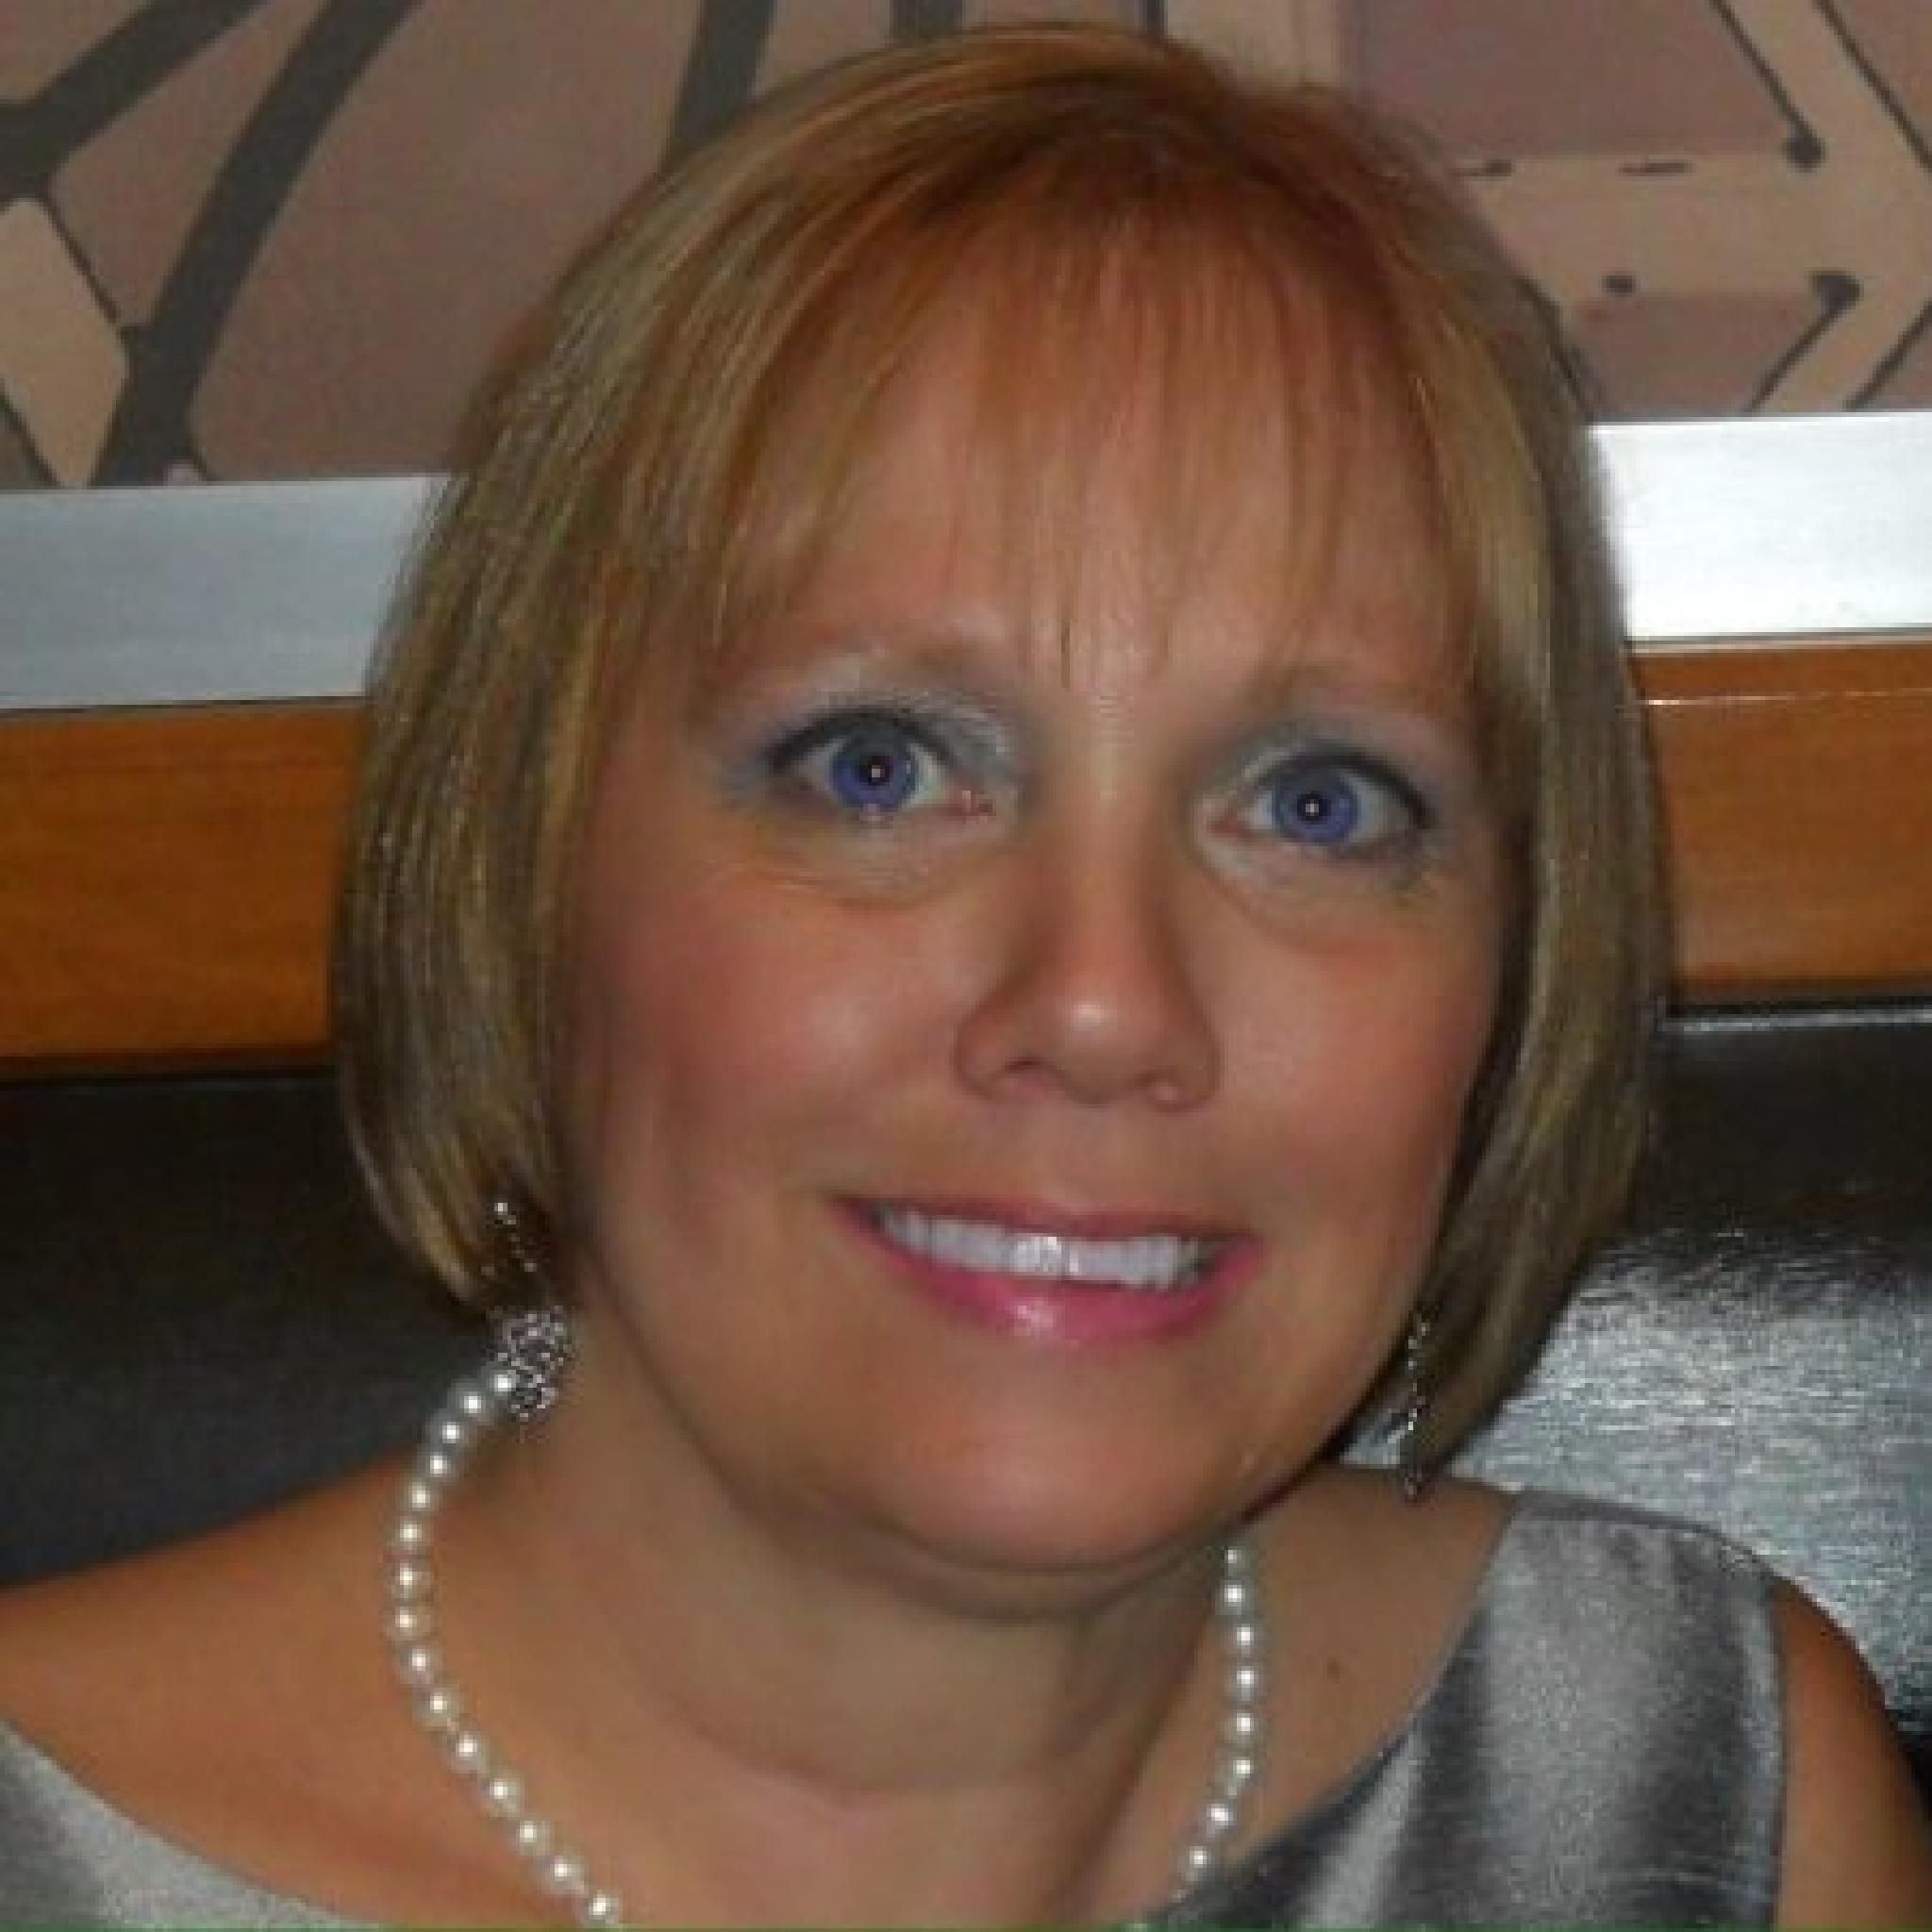 Julie Jackson Profile Photo - Linkedin by JJacksonSFS